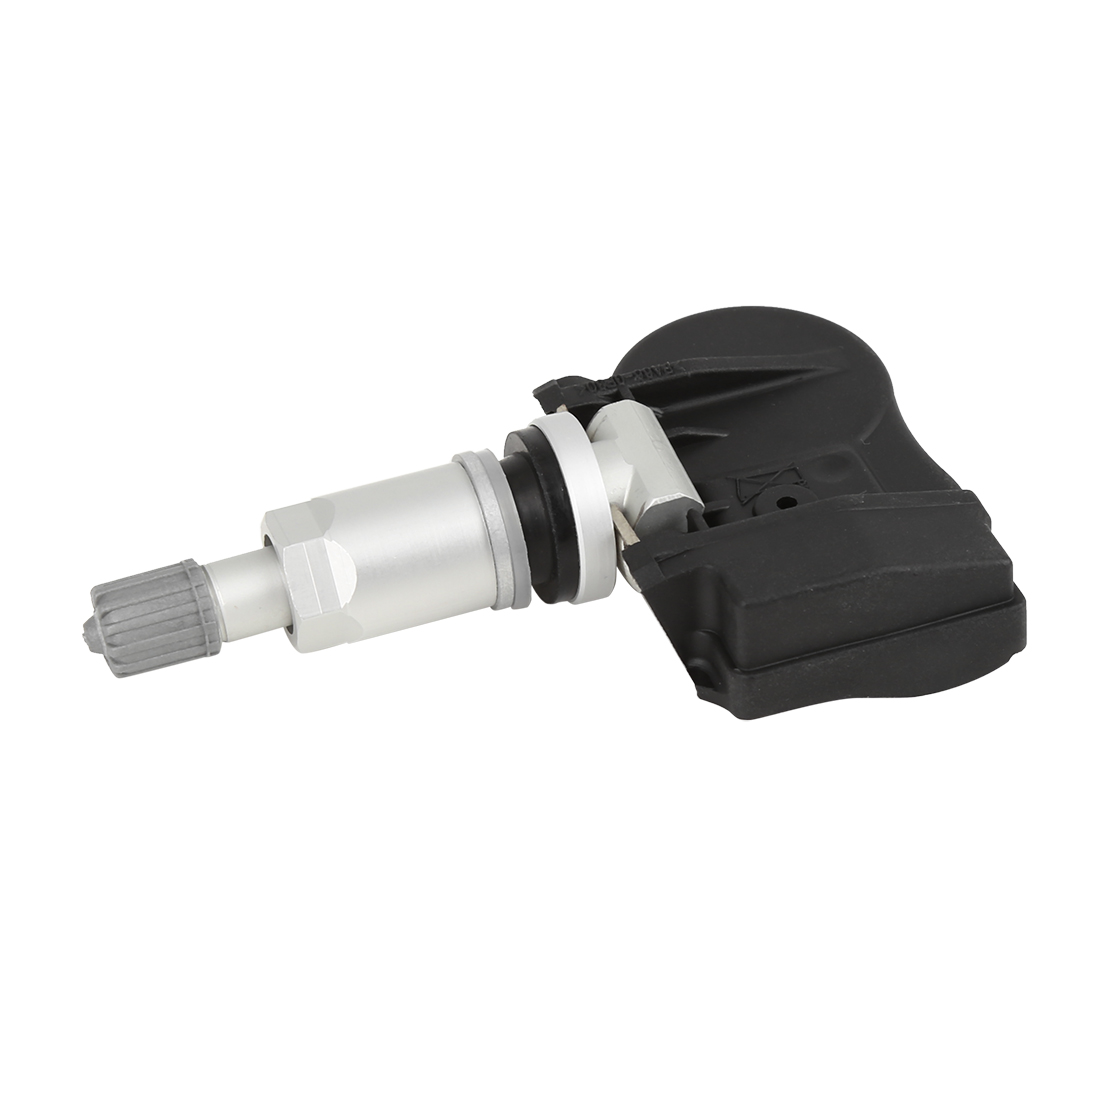 56029526AA 56053030AC Car Tire Pressure Sensor TPMS 315MHz for Chrysler 200